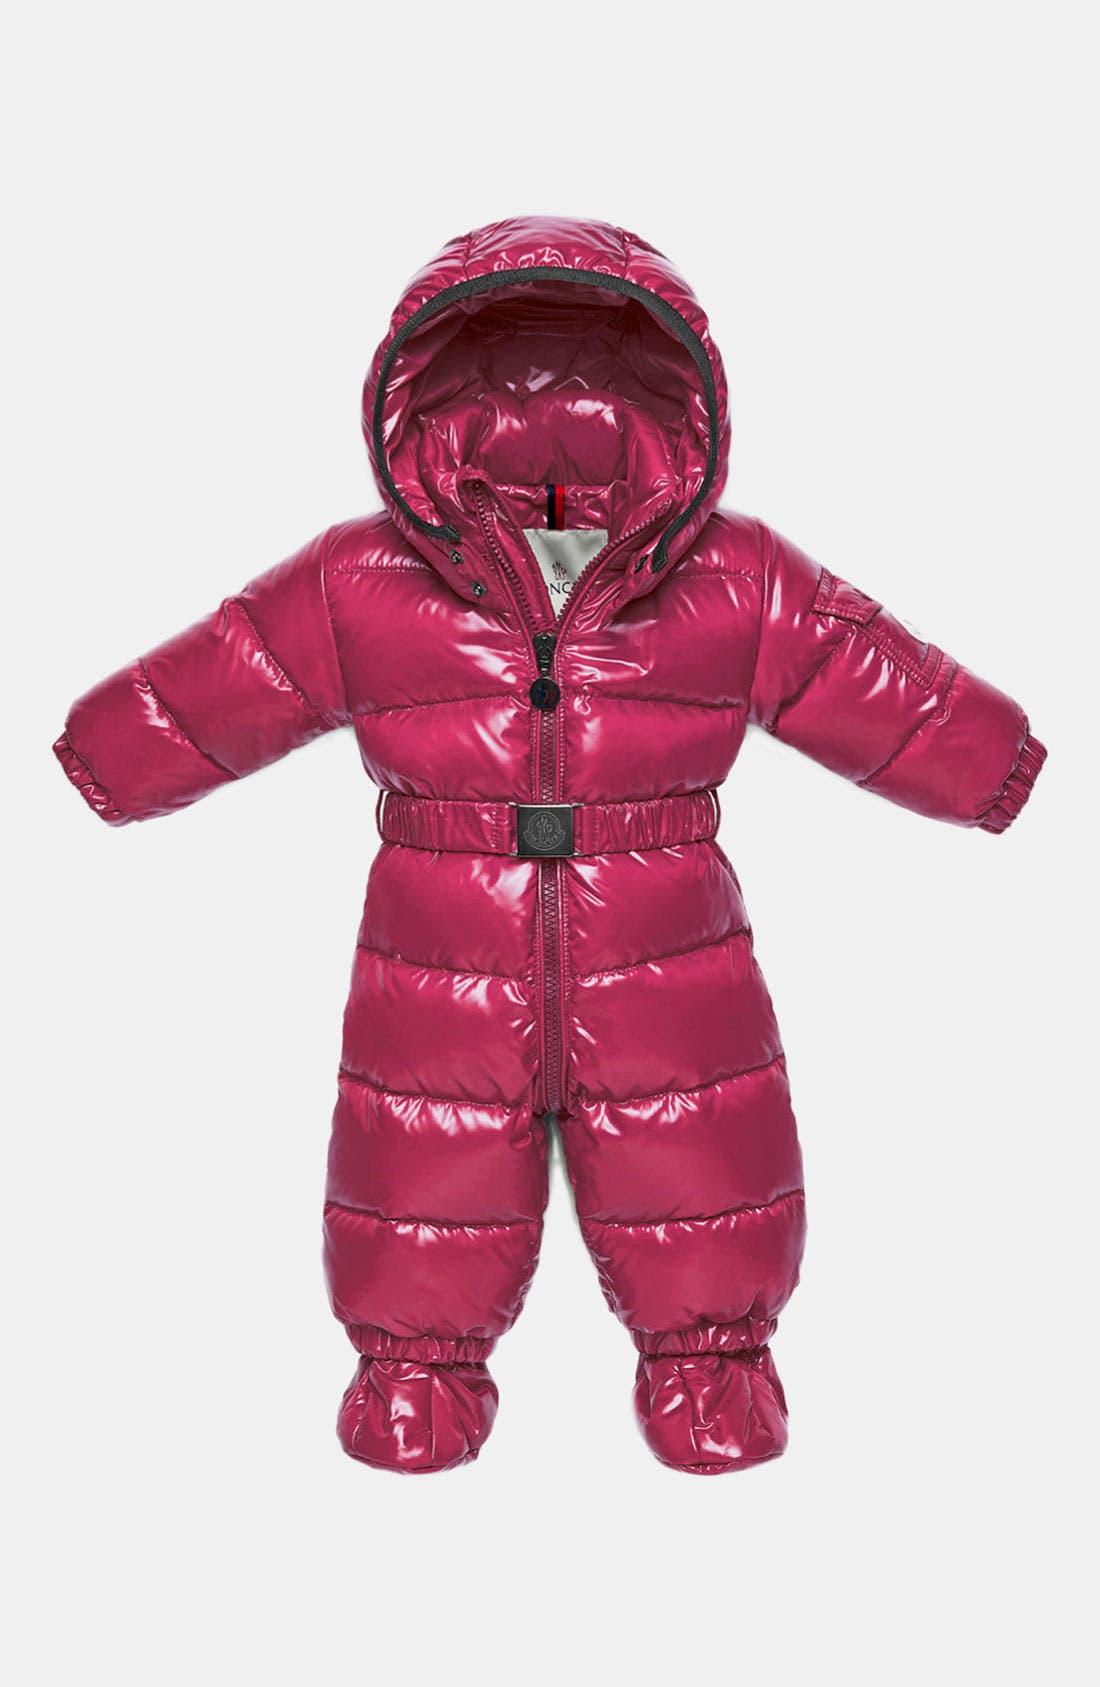 Alternate Image 1 Selected - Moncler 'Amandes' Puffer Snowsuit (Infant)